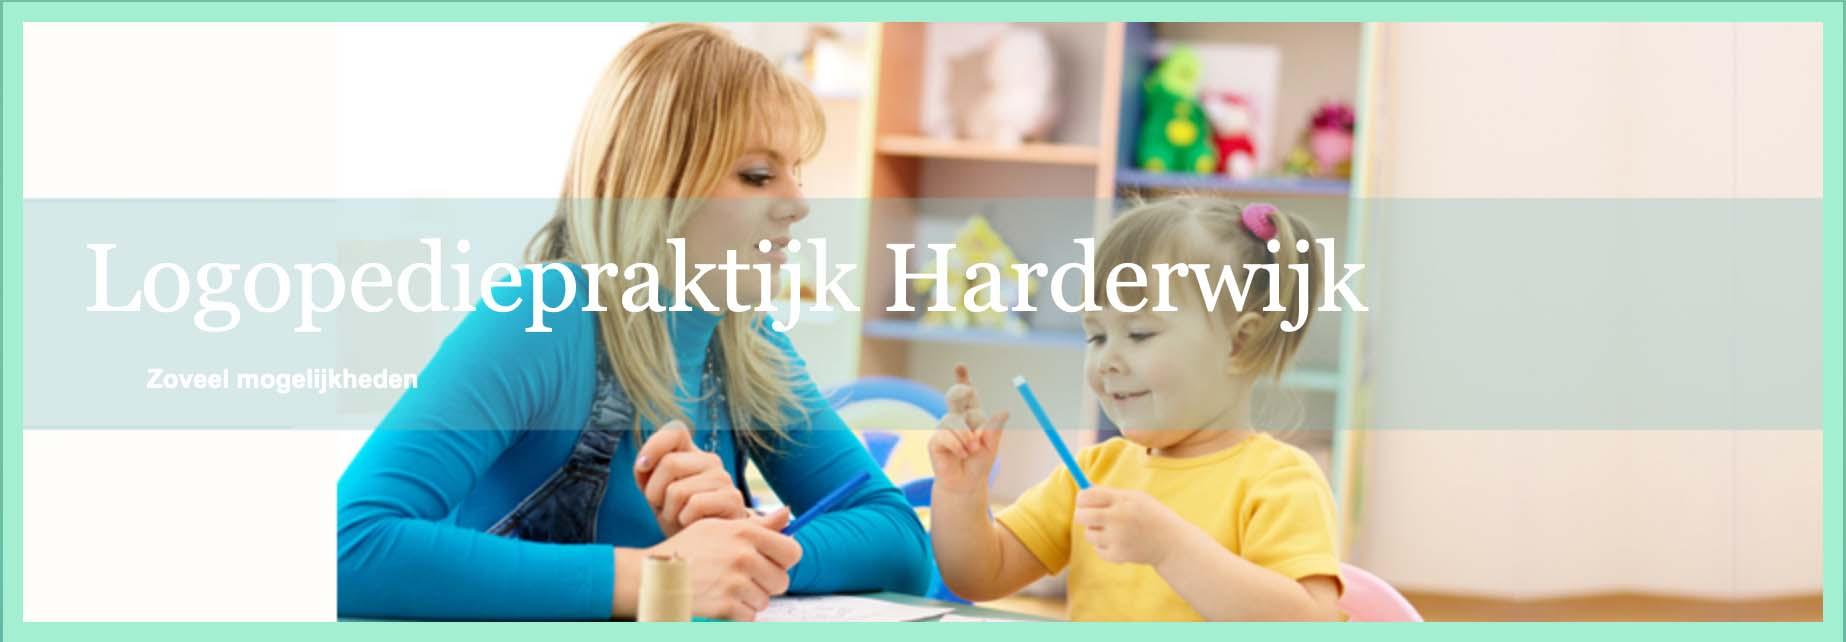 Logopediepraktijk Harderwijk